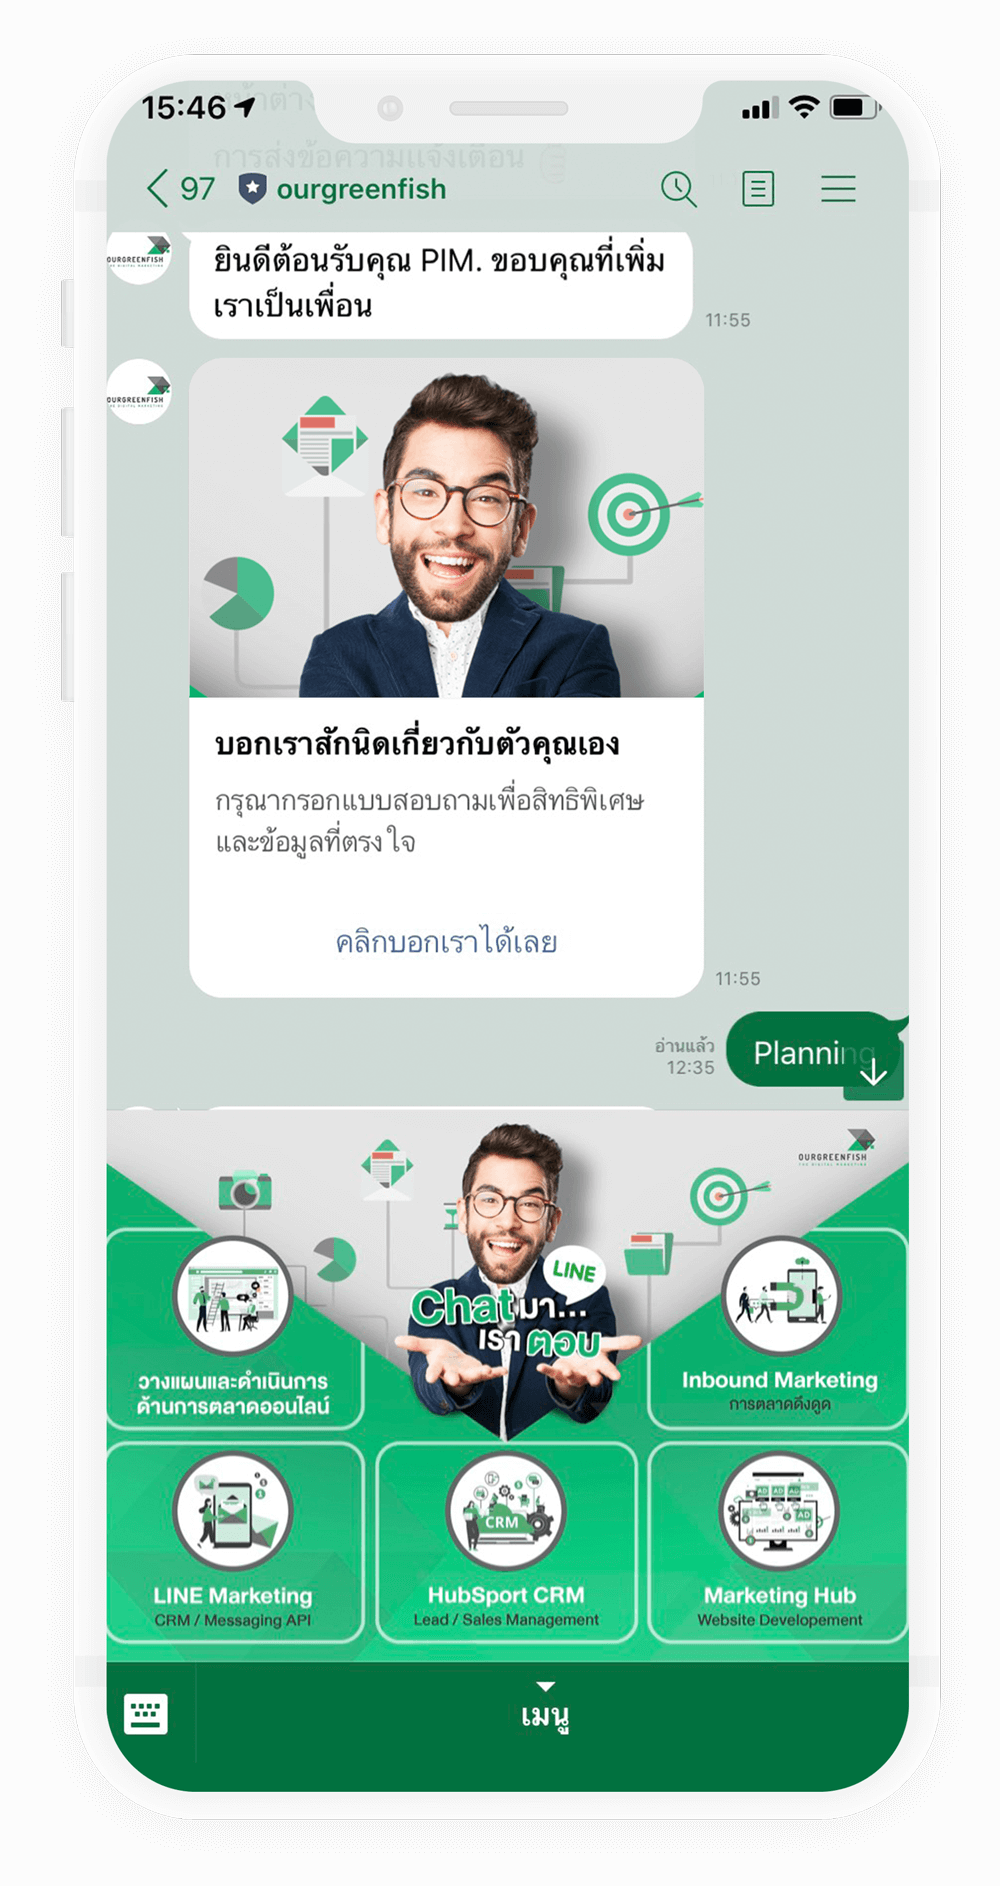 line-marketing-img-mobile-3